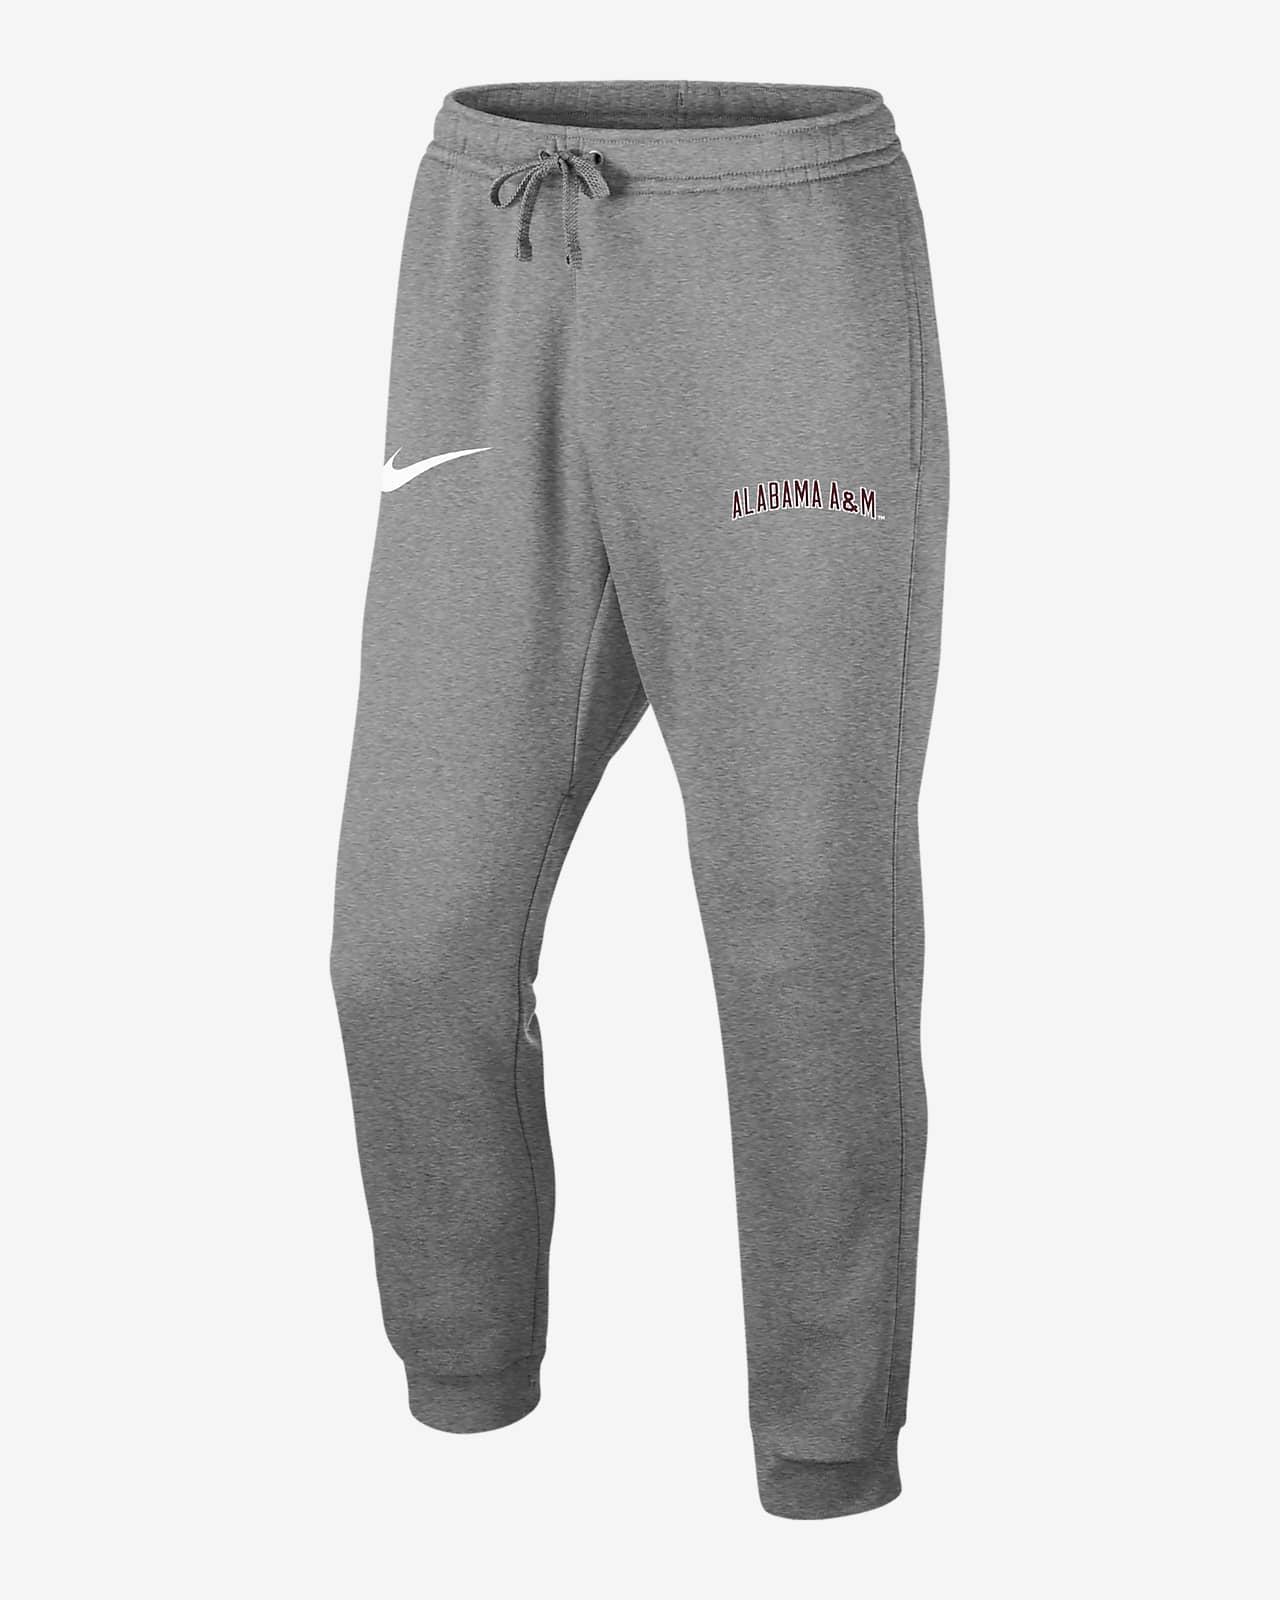 Nike College Club Fleece (Alabama A&M) Joggers